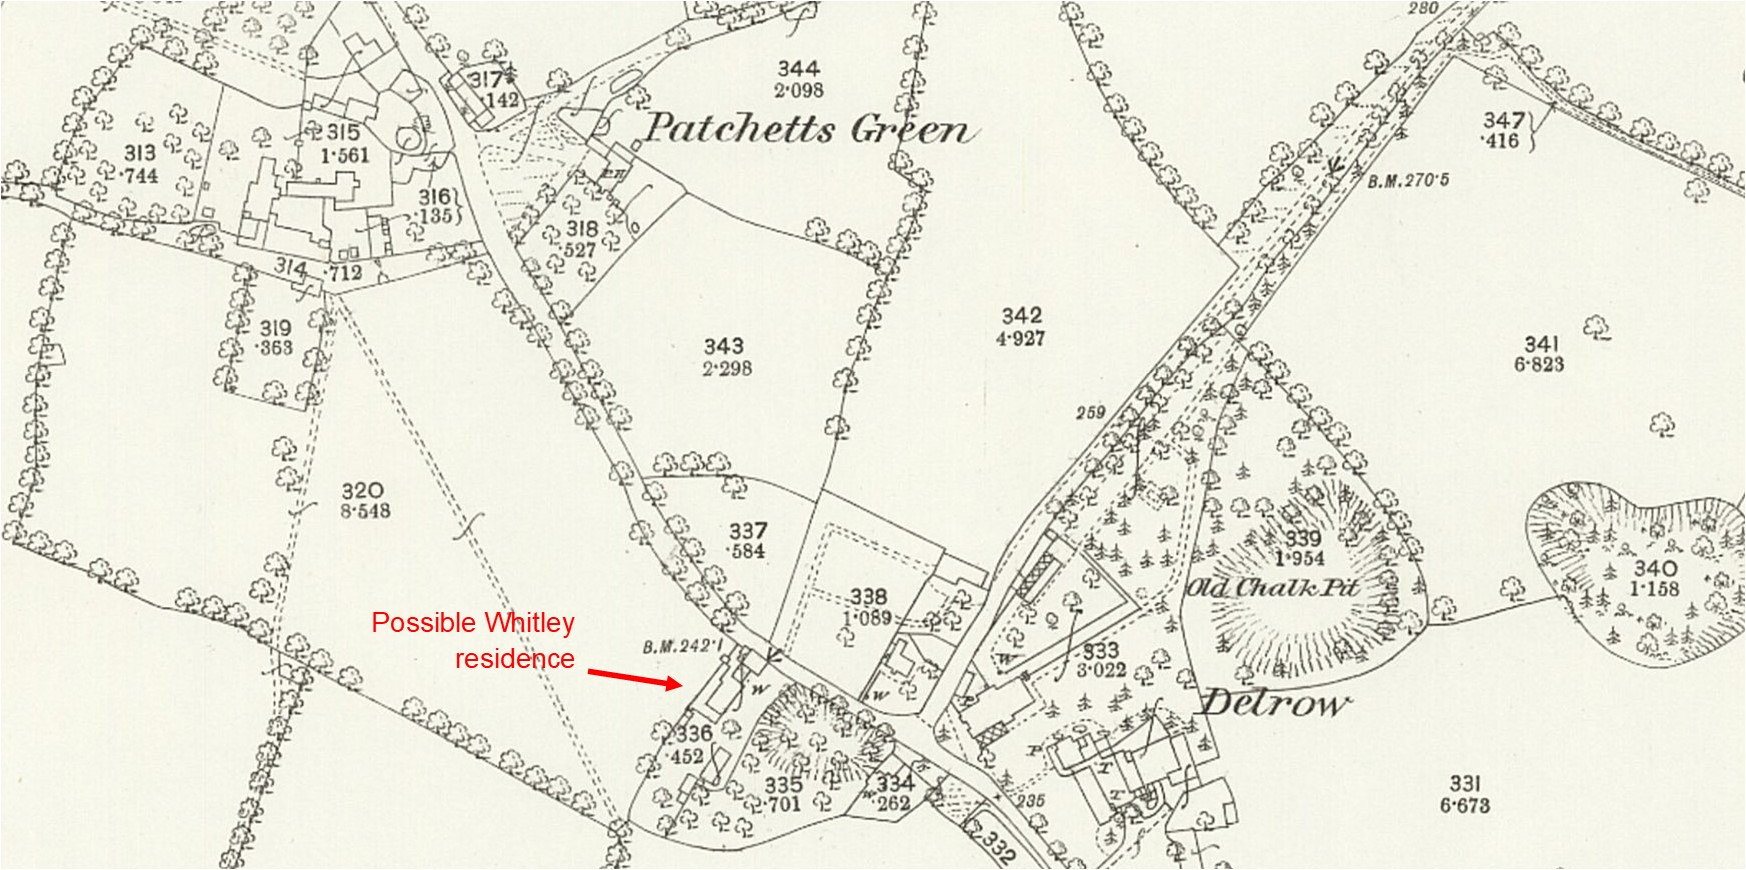 1872-Ordnance Survey 25 inch map Hertfordshire XLIV.3 (detail) - National Library of Scotland